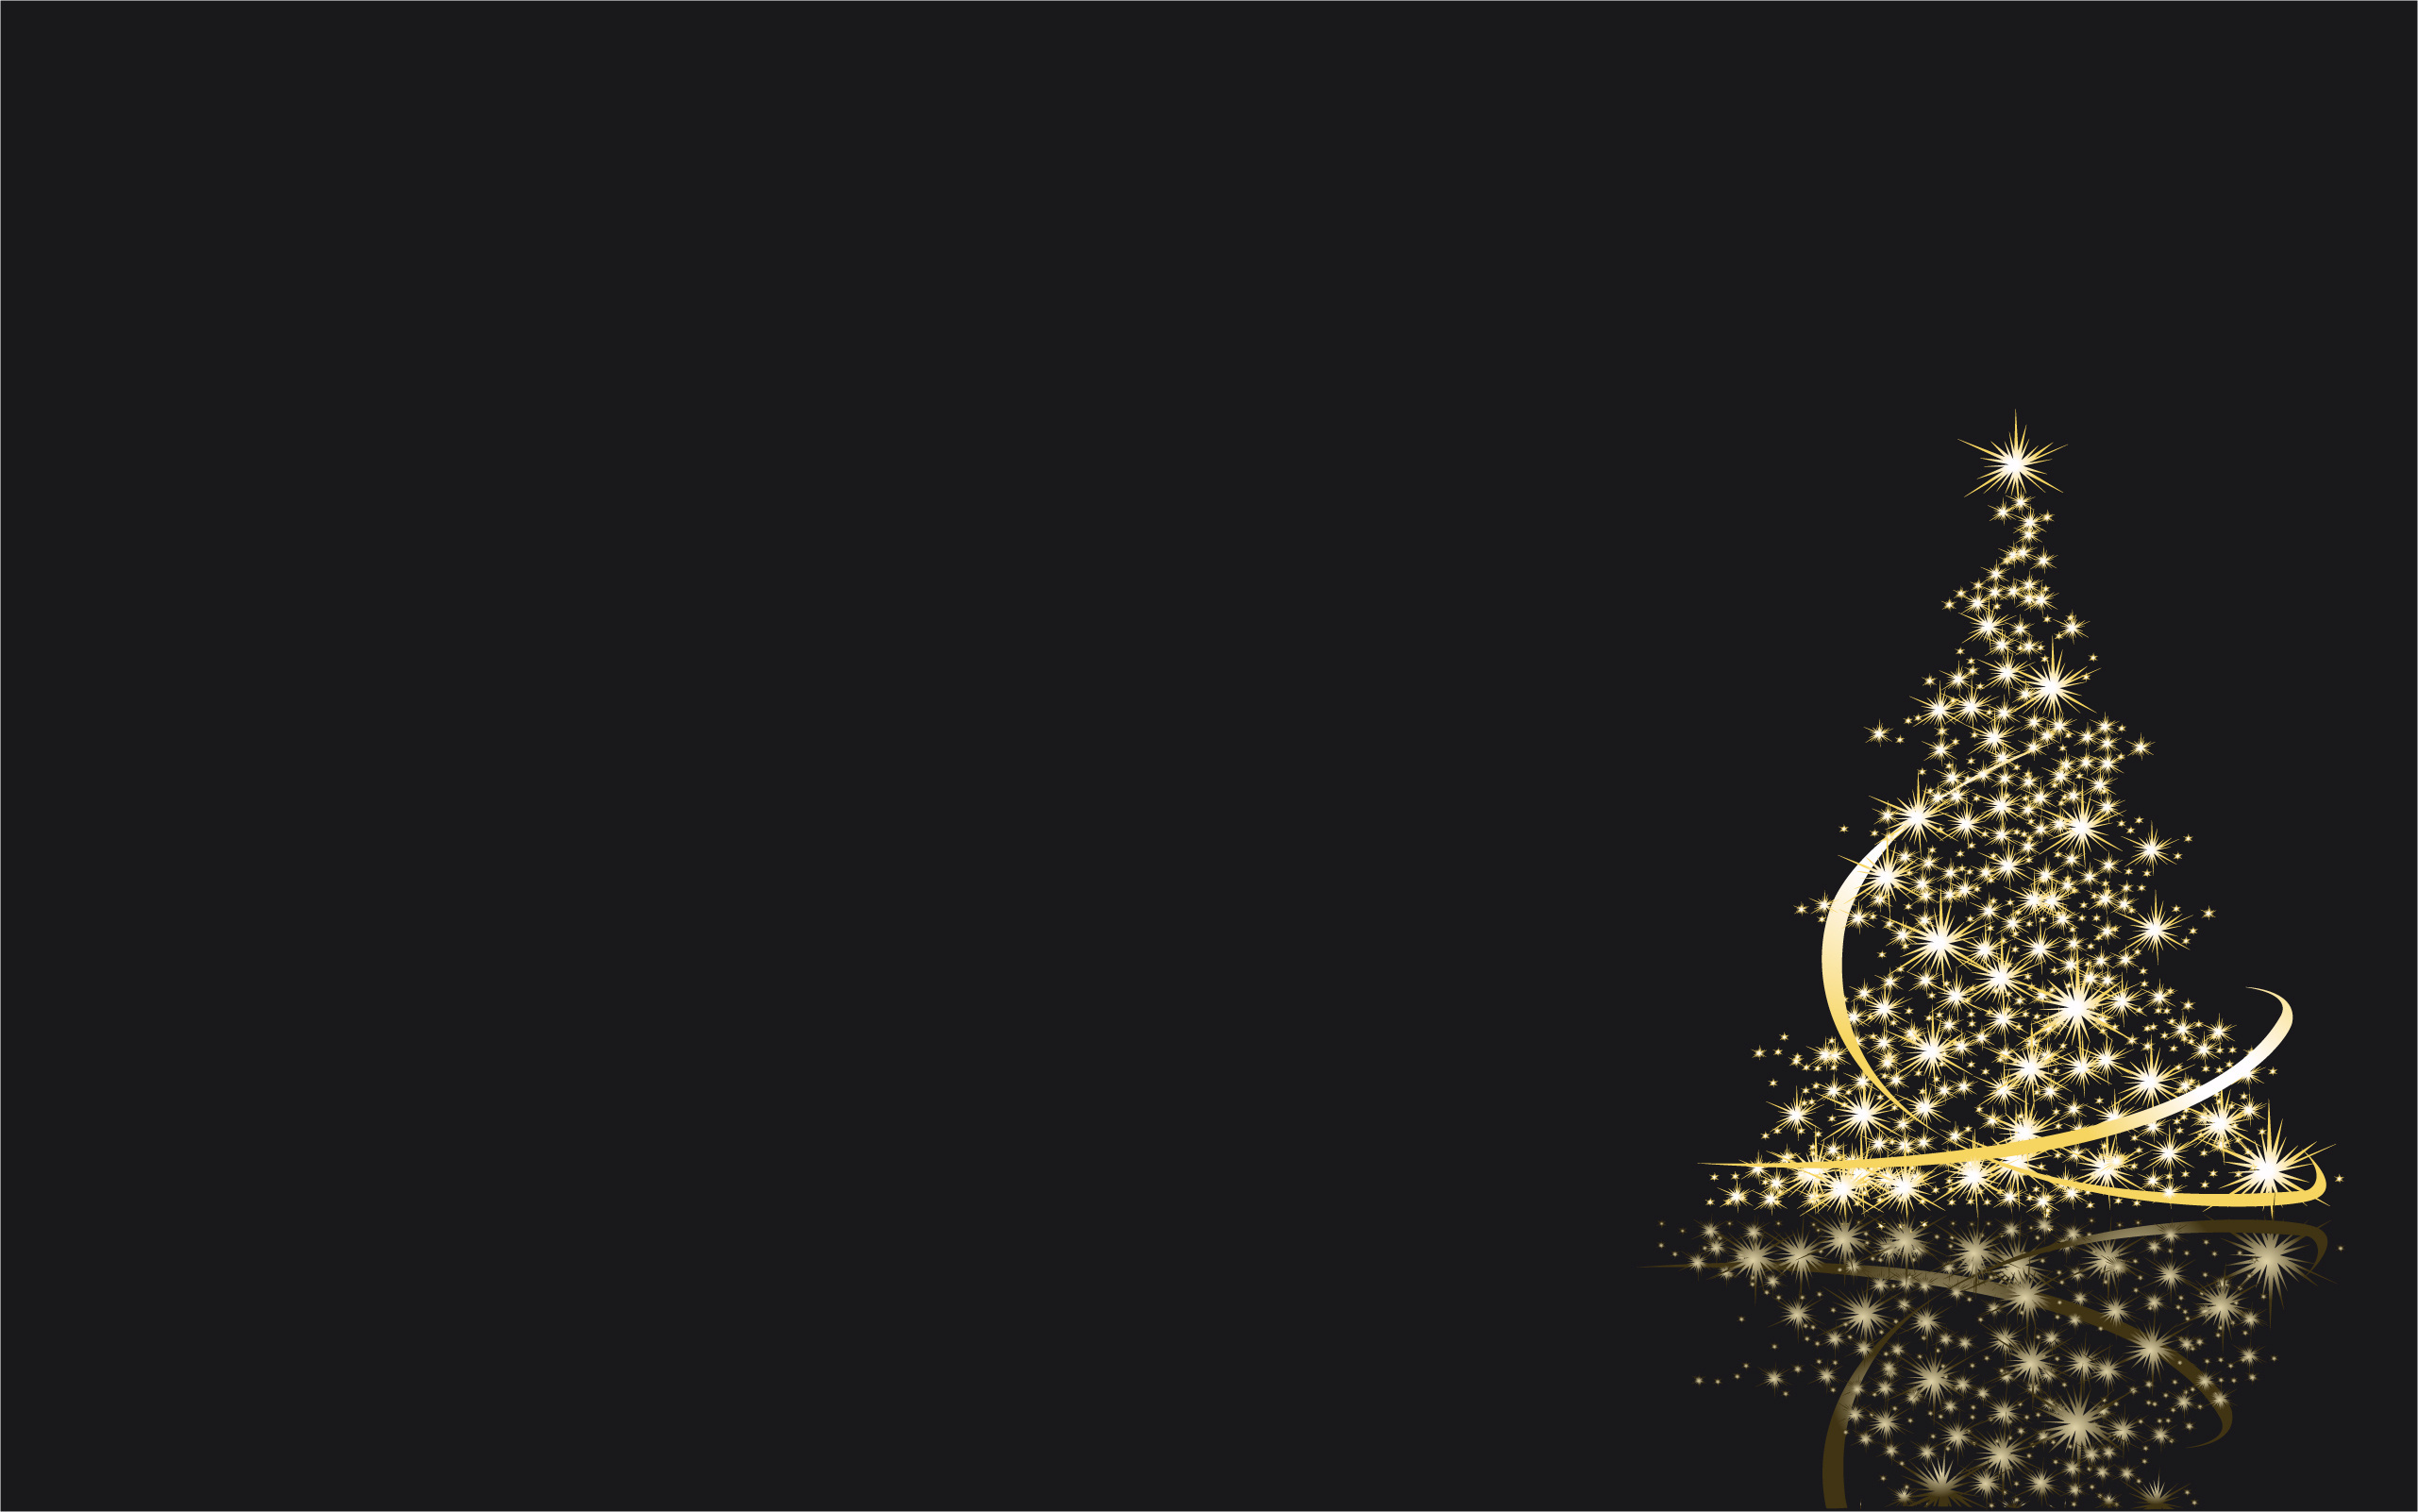 Blue Christmas Tree Forum Avatar: Boże Narodzenie Tapeta HD